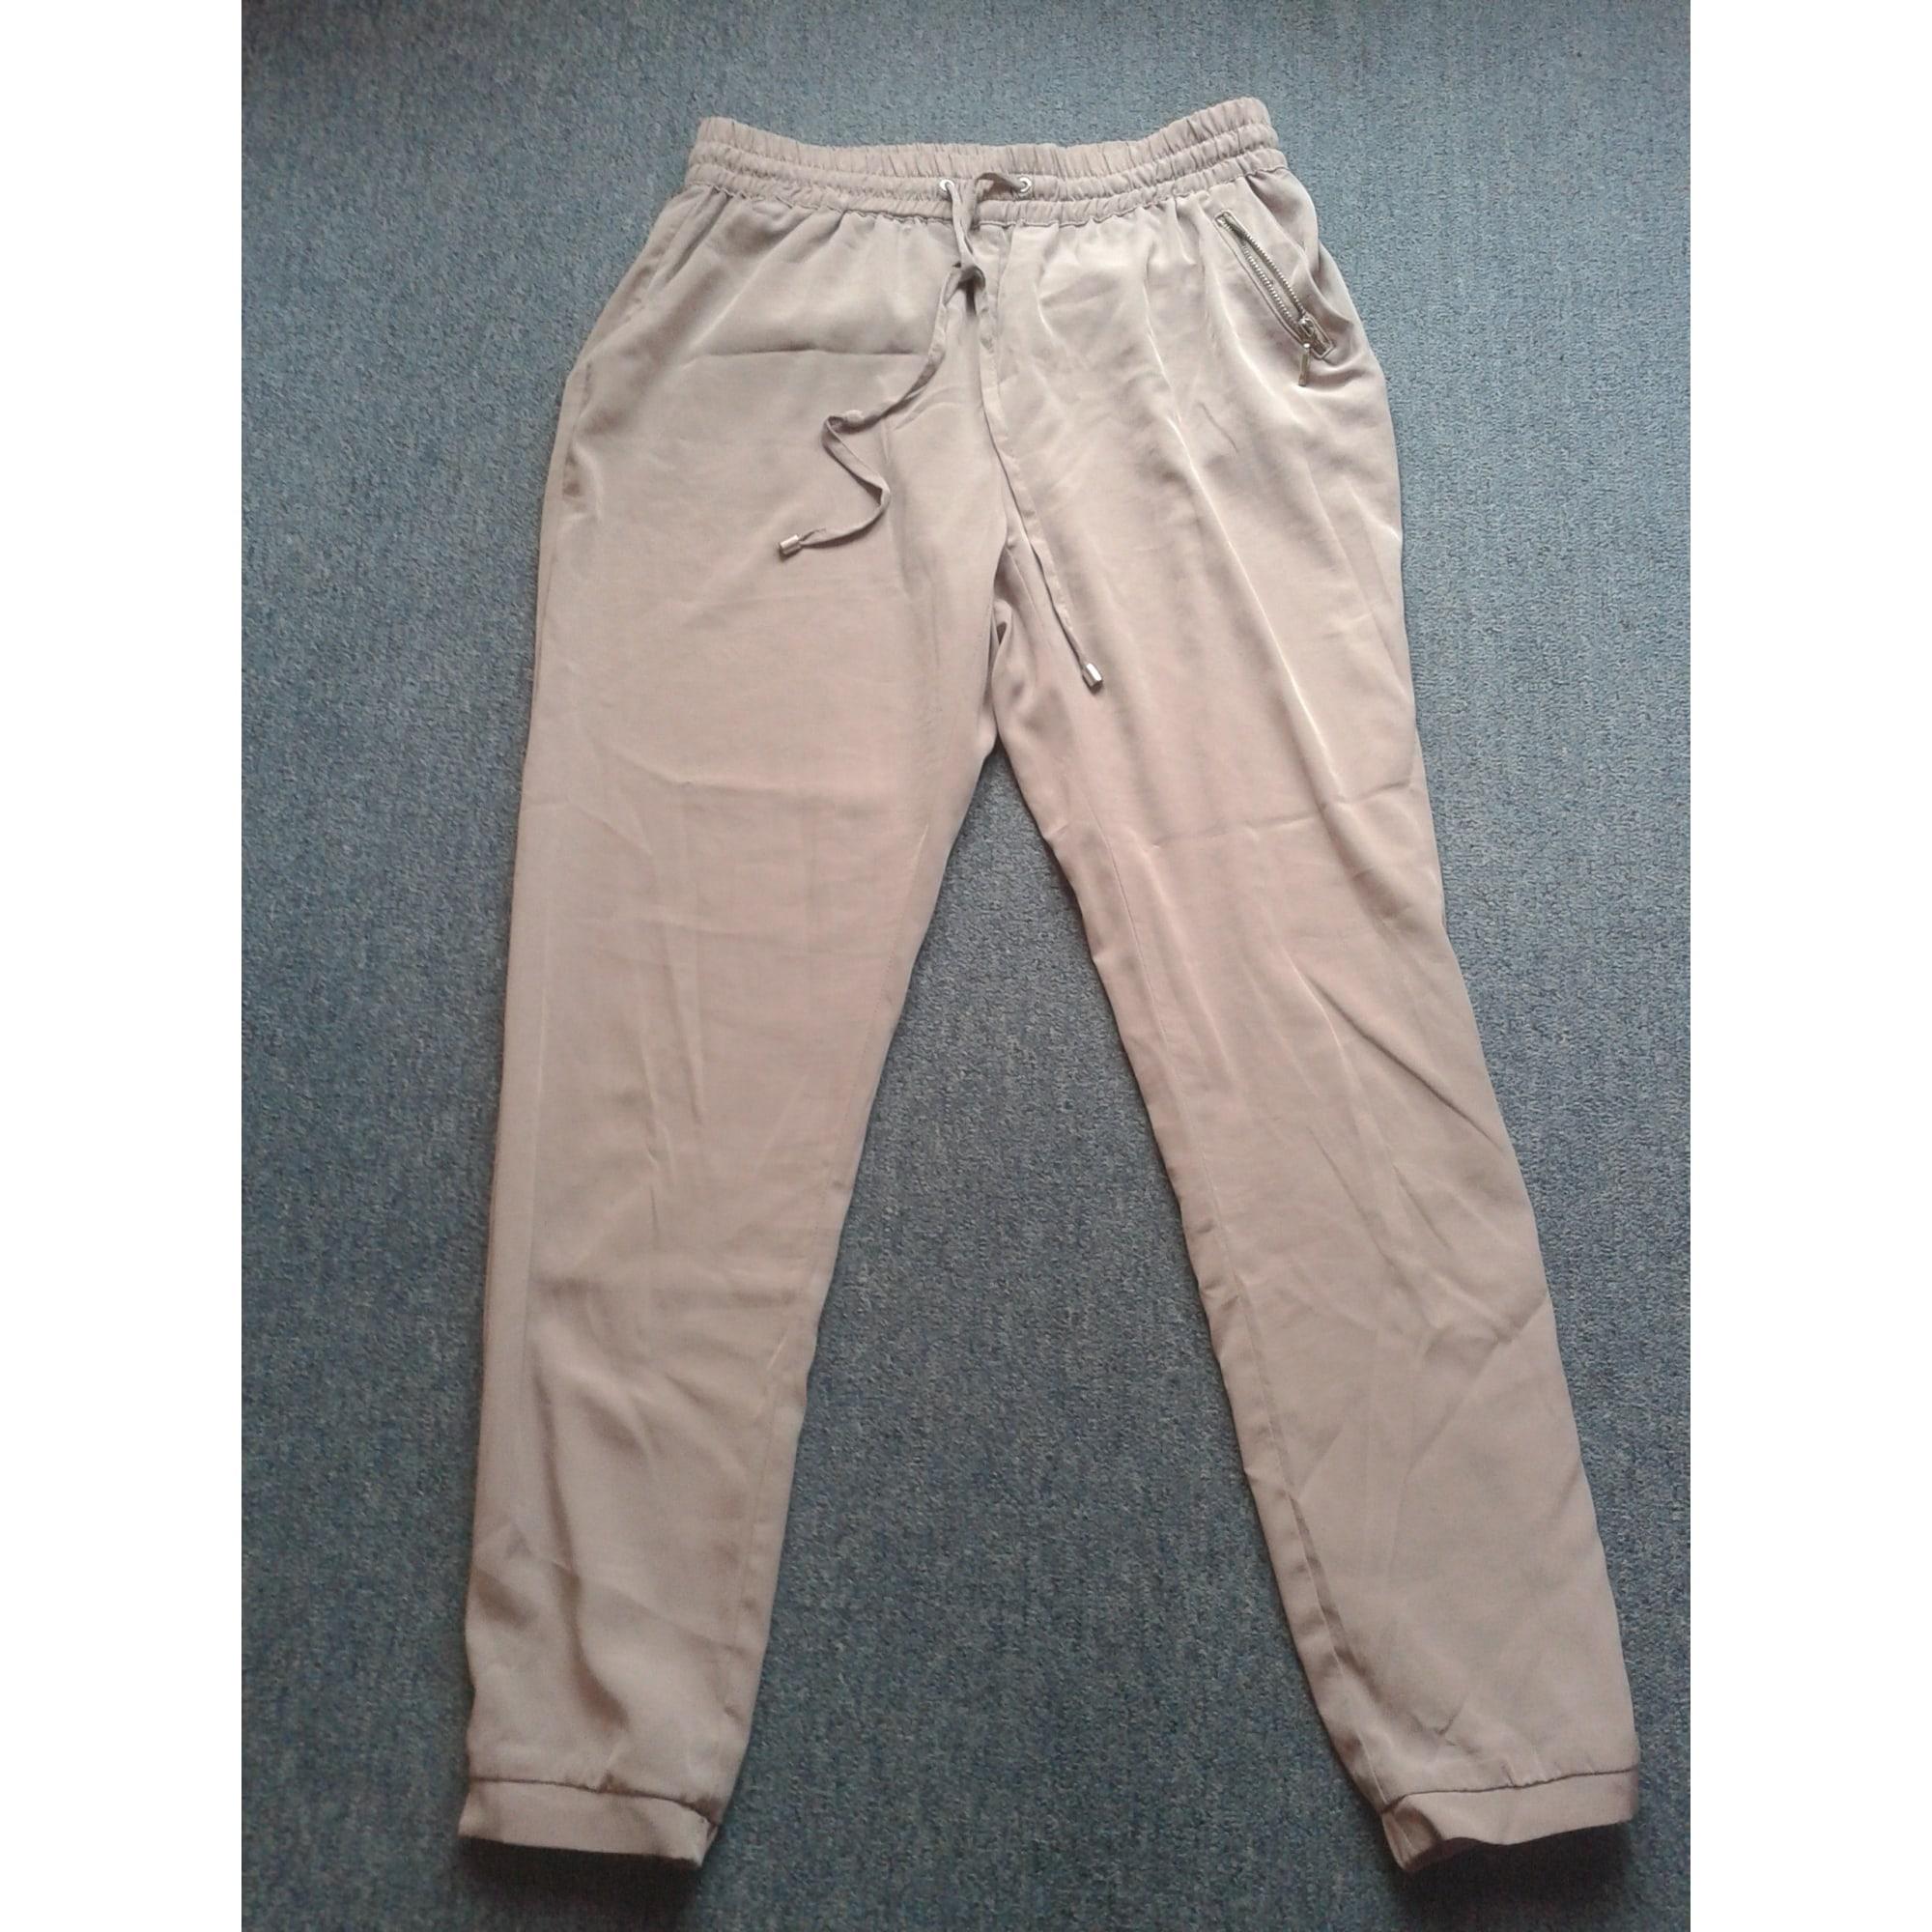 Pantalon large BERSHKA Beige, camel